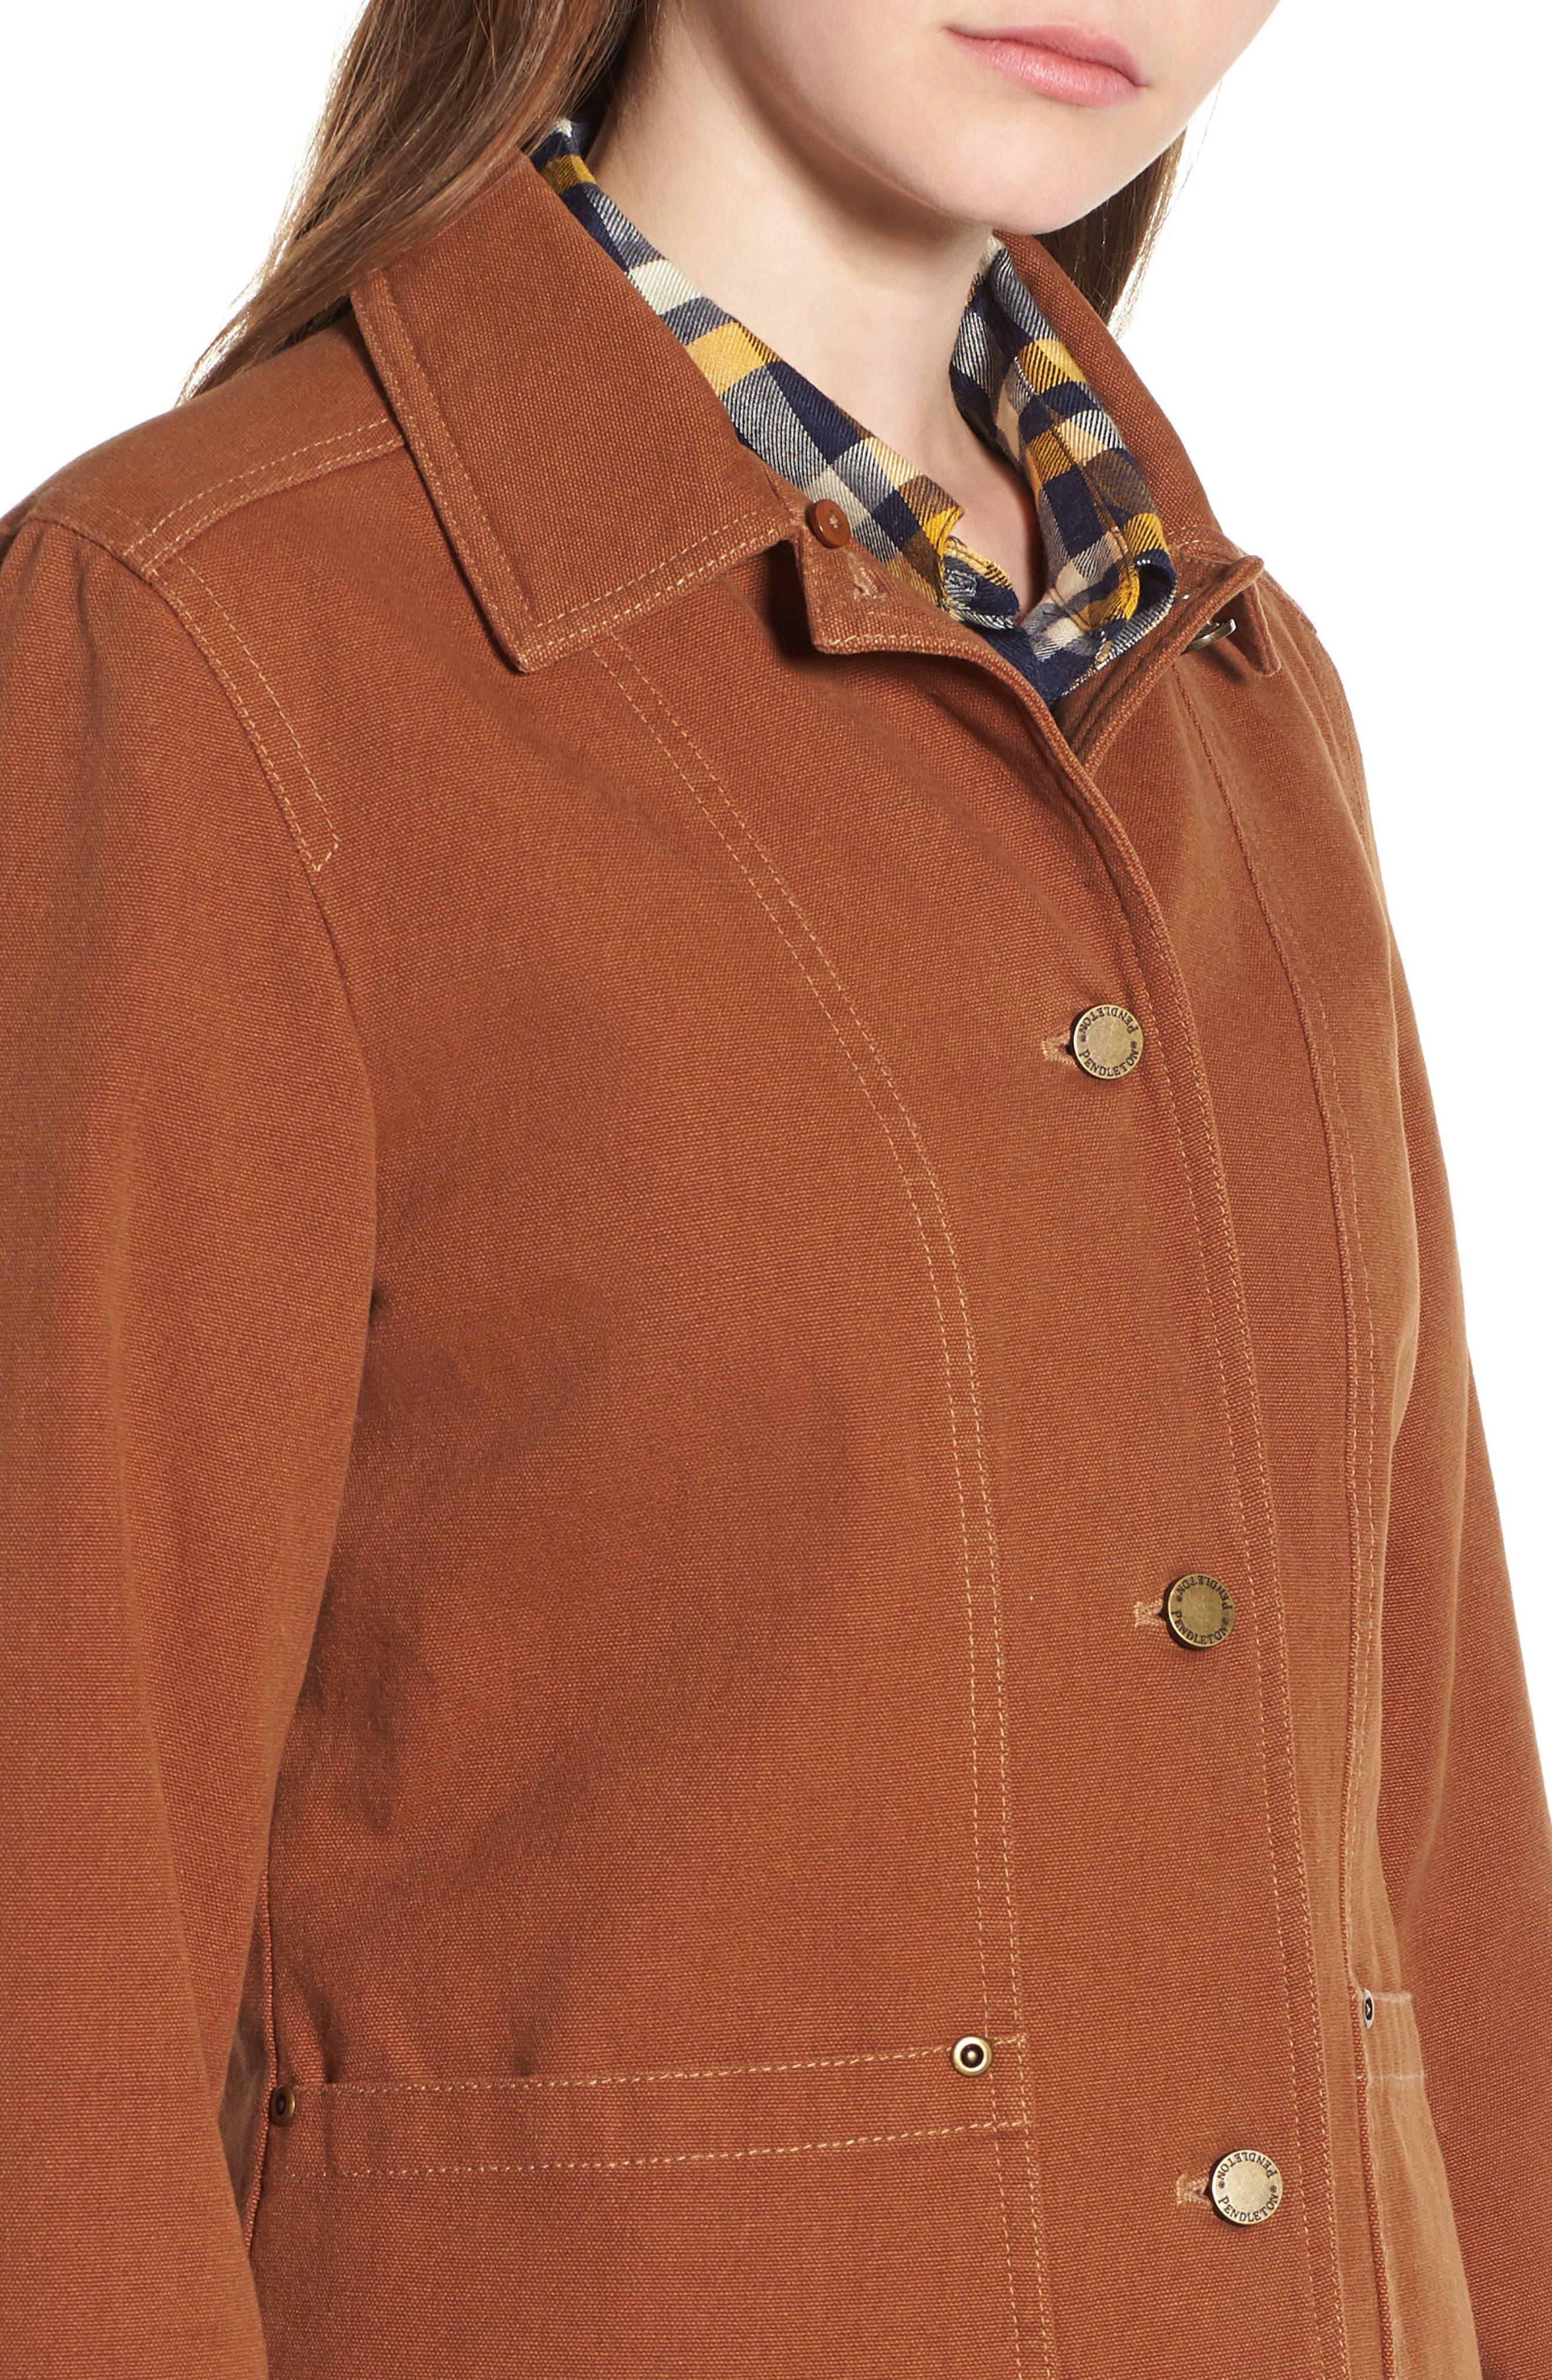 Madison Jacket,                             Alternate thumbnail 4, color,                             235